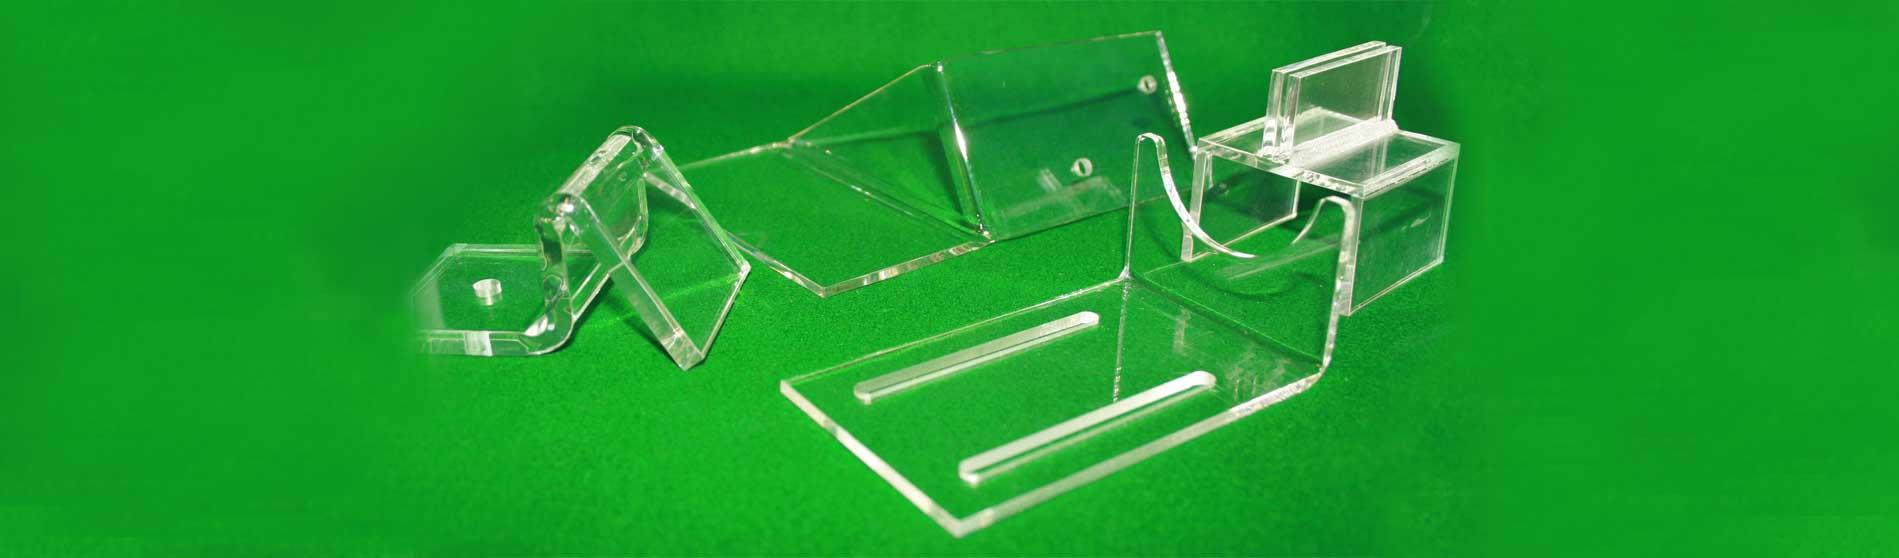 Plastic Fabrication, Repairs, Design & Engineering Services